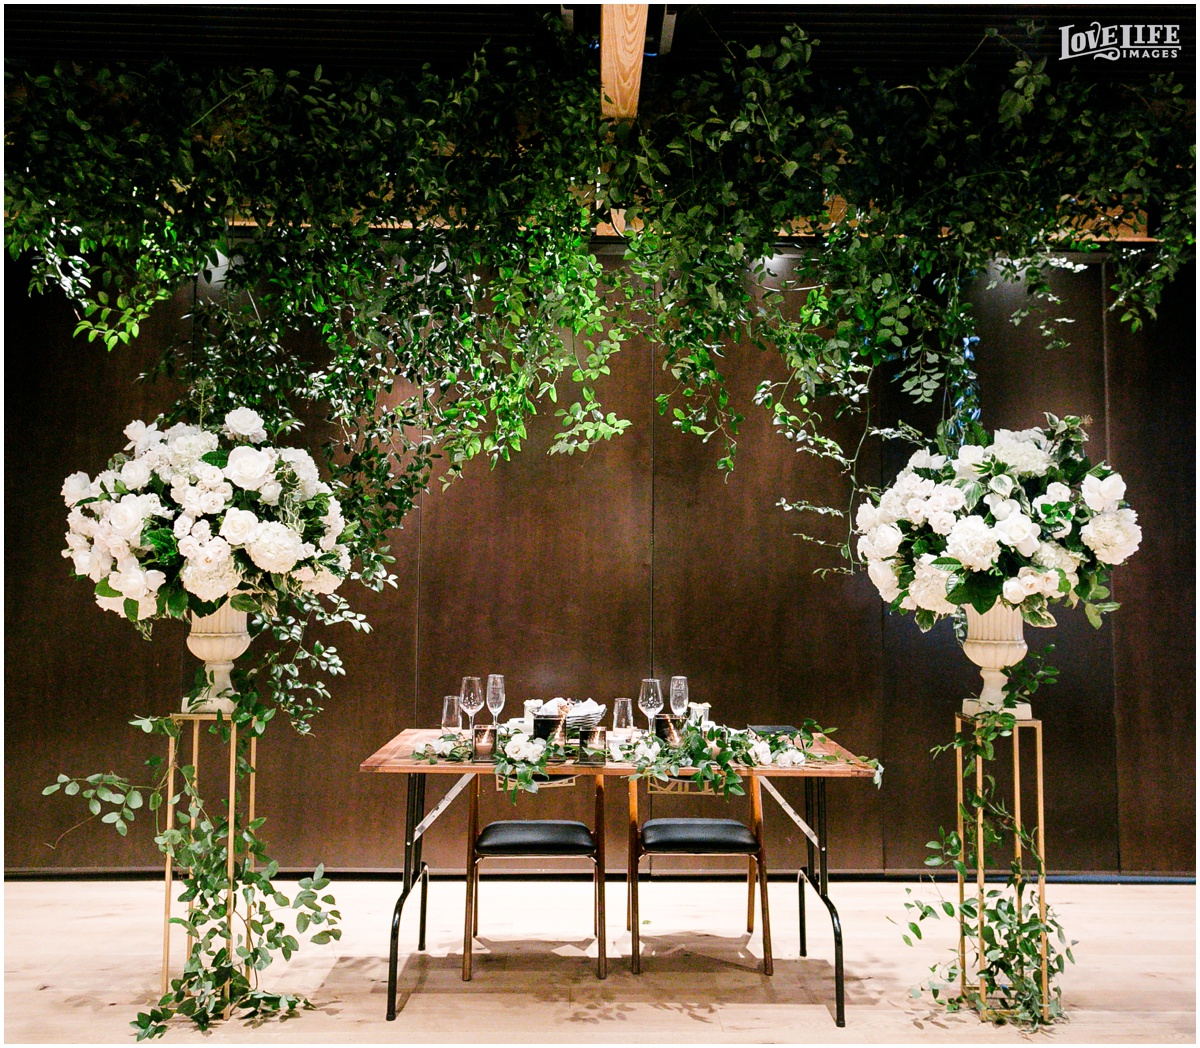 Winter District Winery Wedding Sweetheart table.JPG